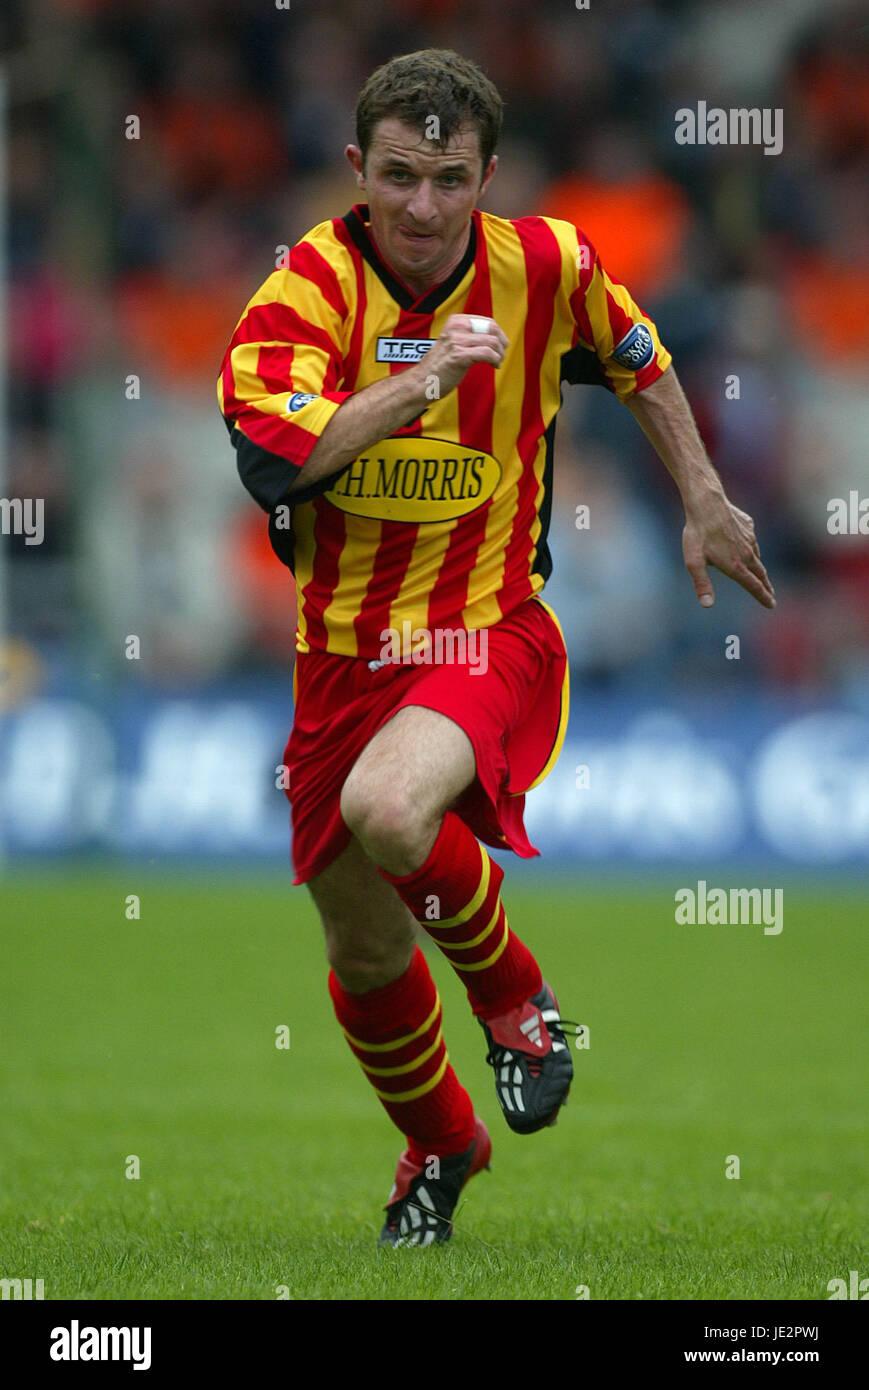 PAUL WALKER PARTICK THISTLE FC FIRHILL GLASGOW SCOTLAND 03 August 2002 - Stock Image